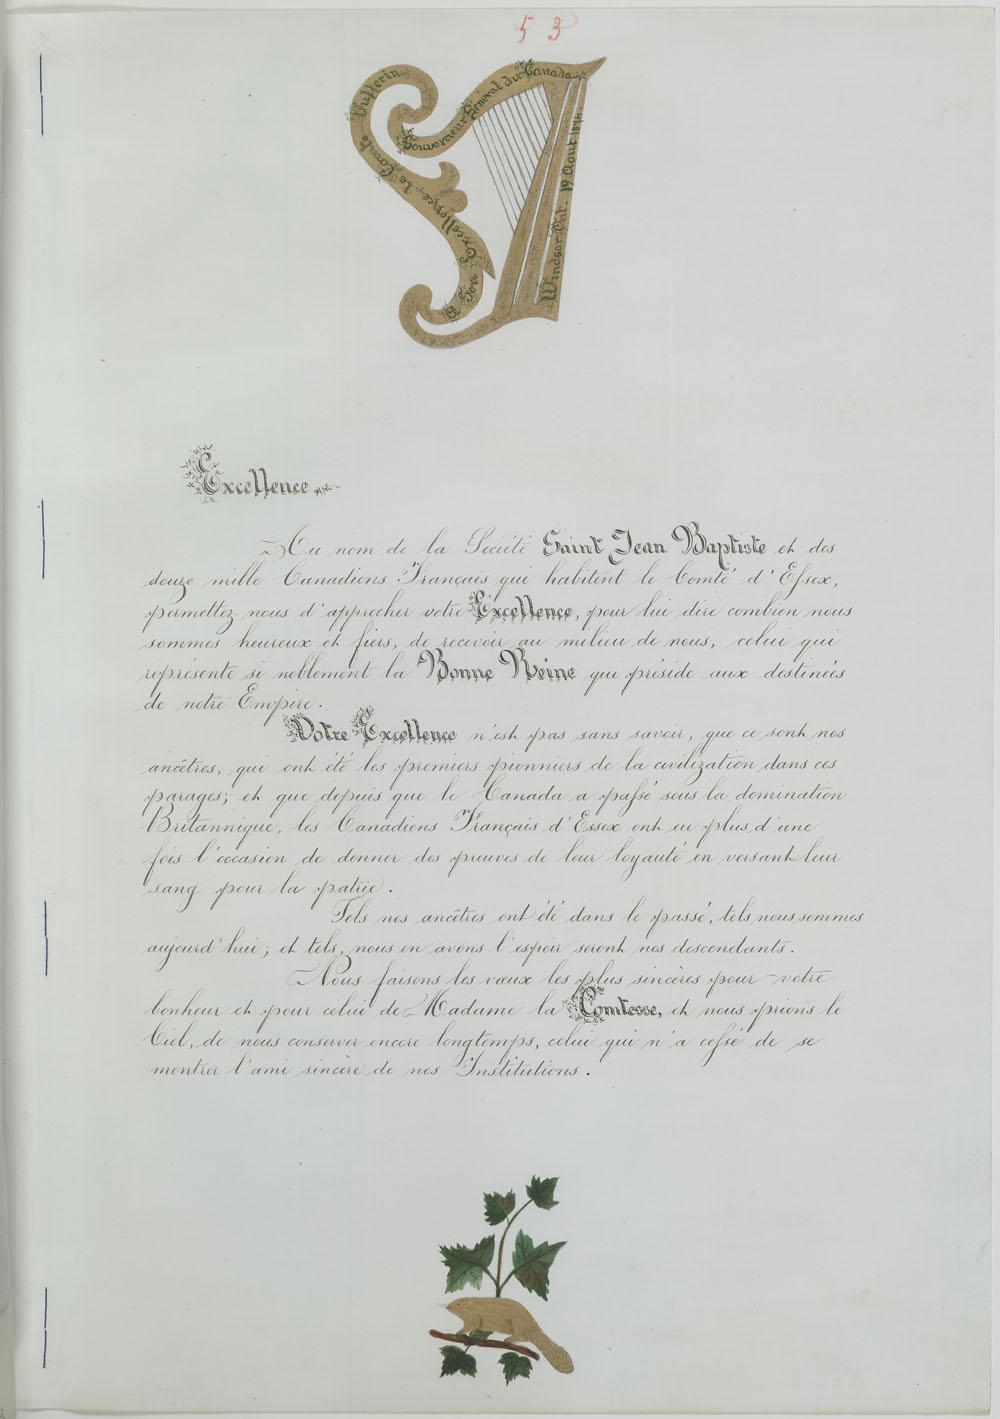 Address to Lord Dufferin from La Société St. Jean Baptiste of Essex County, Windsor